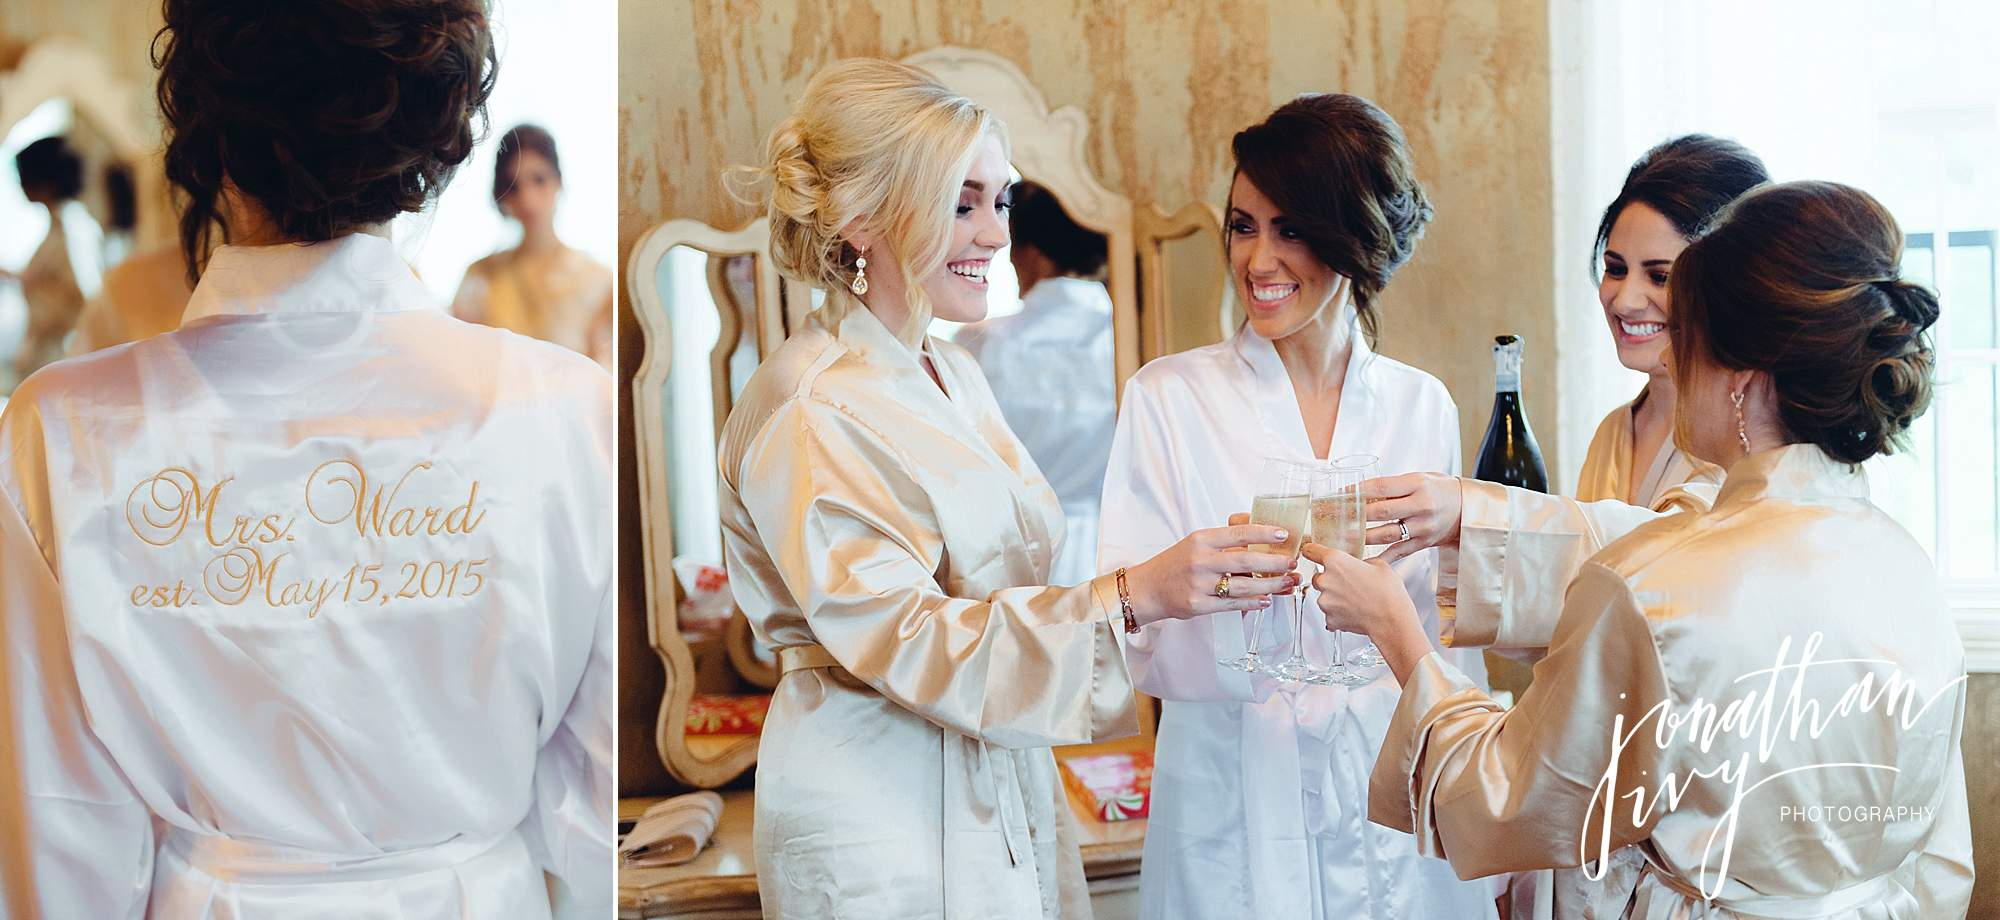 Custom bridesmaid robes